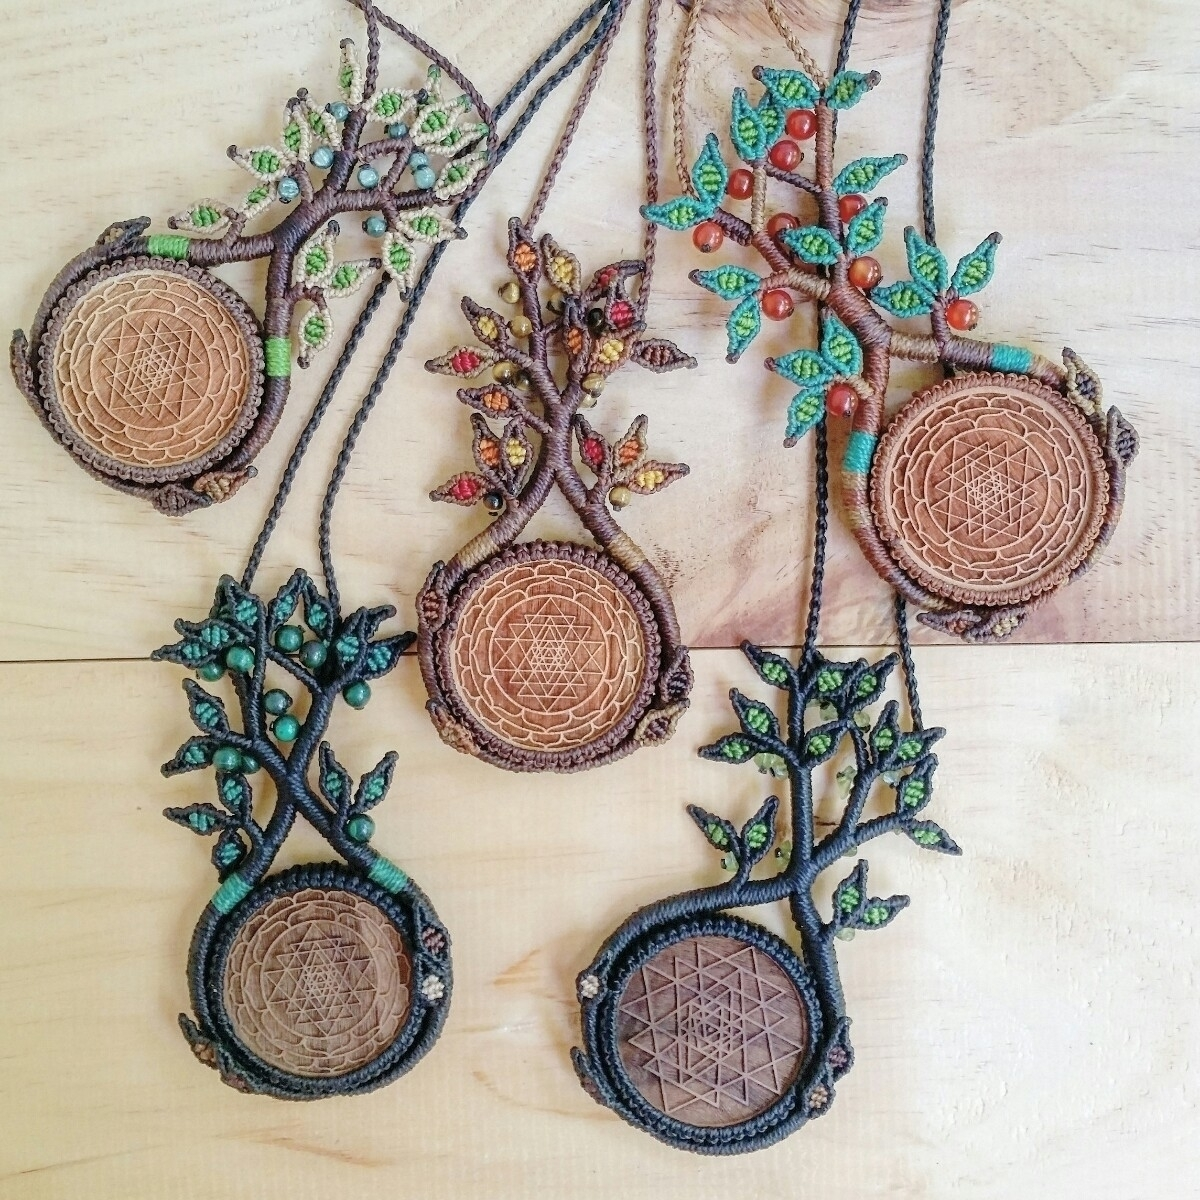 :deciduous_tree::leaves::herb:T - lifelovesmedesigns | ello